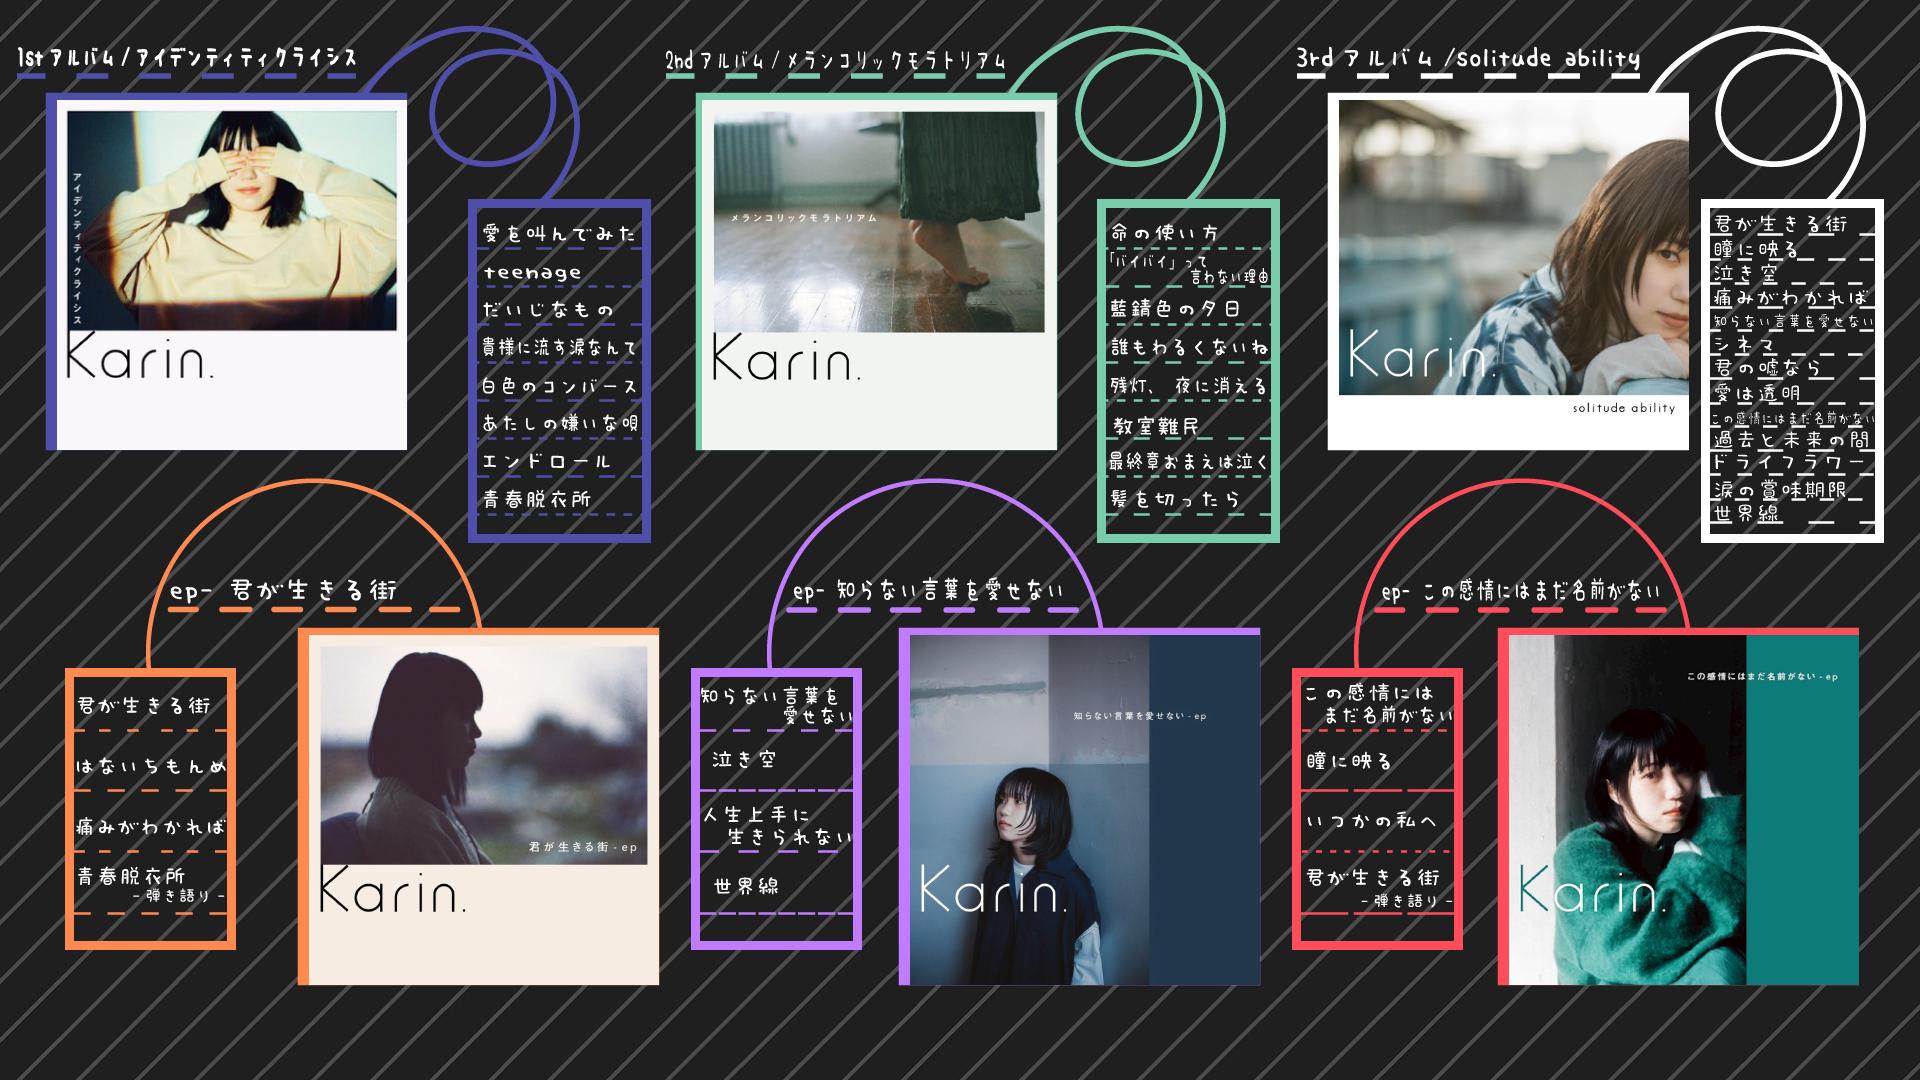 【karin.】シンガーソングライターが大好きなファンが色々と書きます!